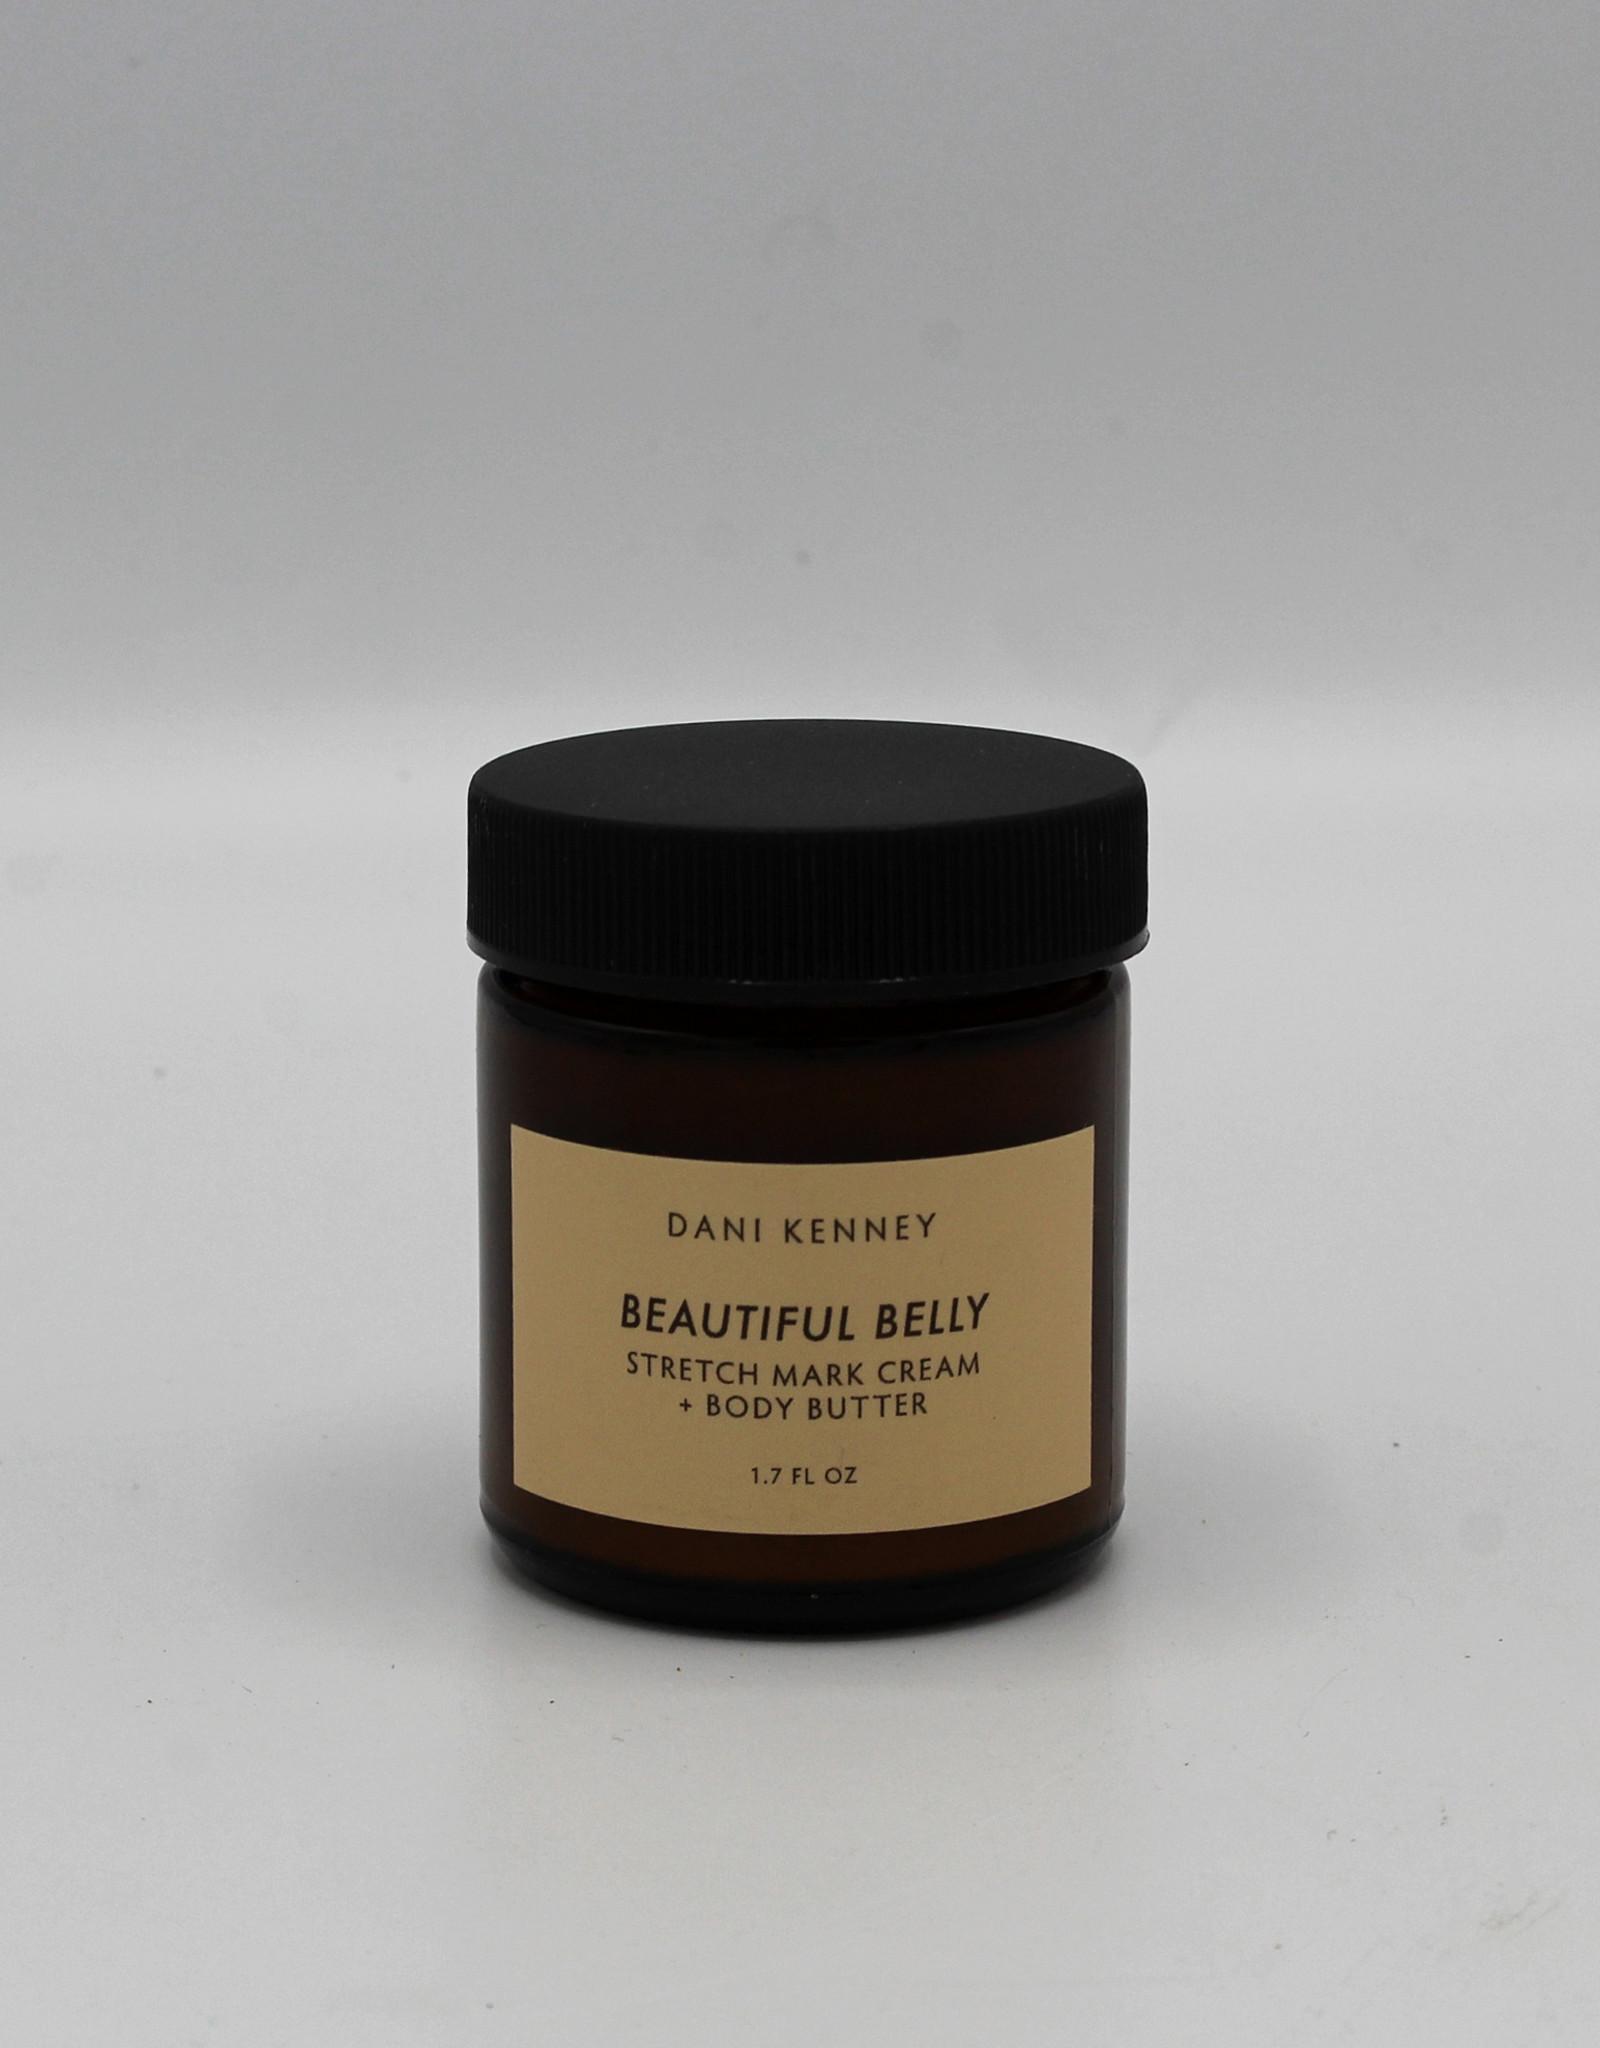 Dani Kenney Beautiful Belly Cream